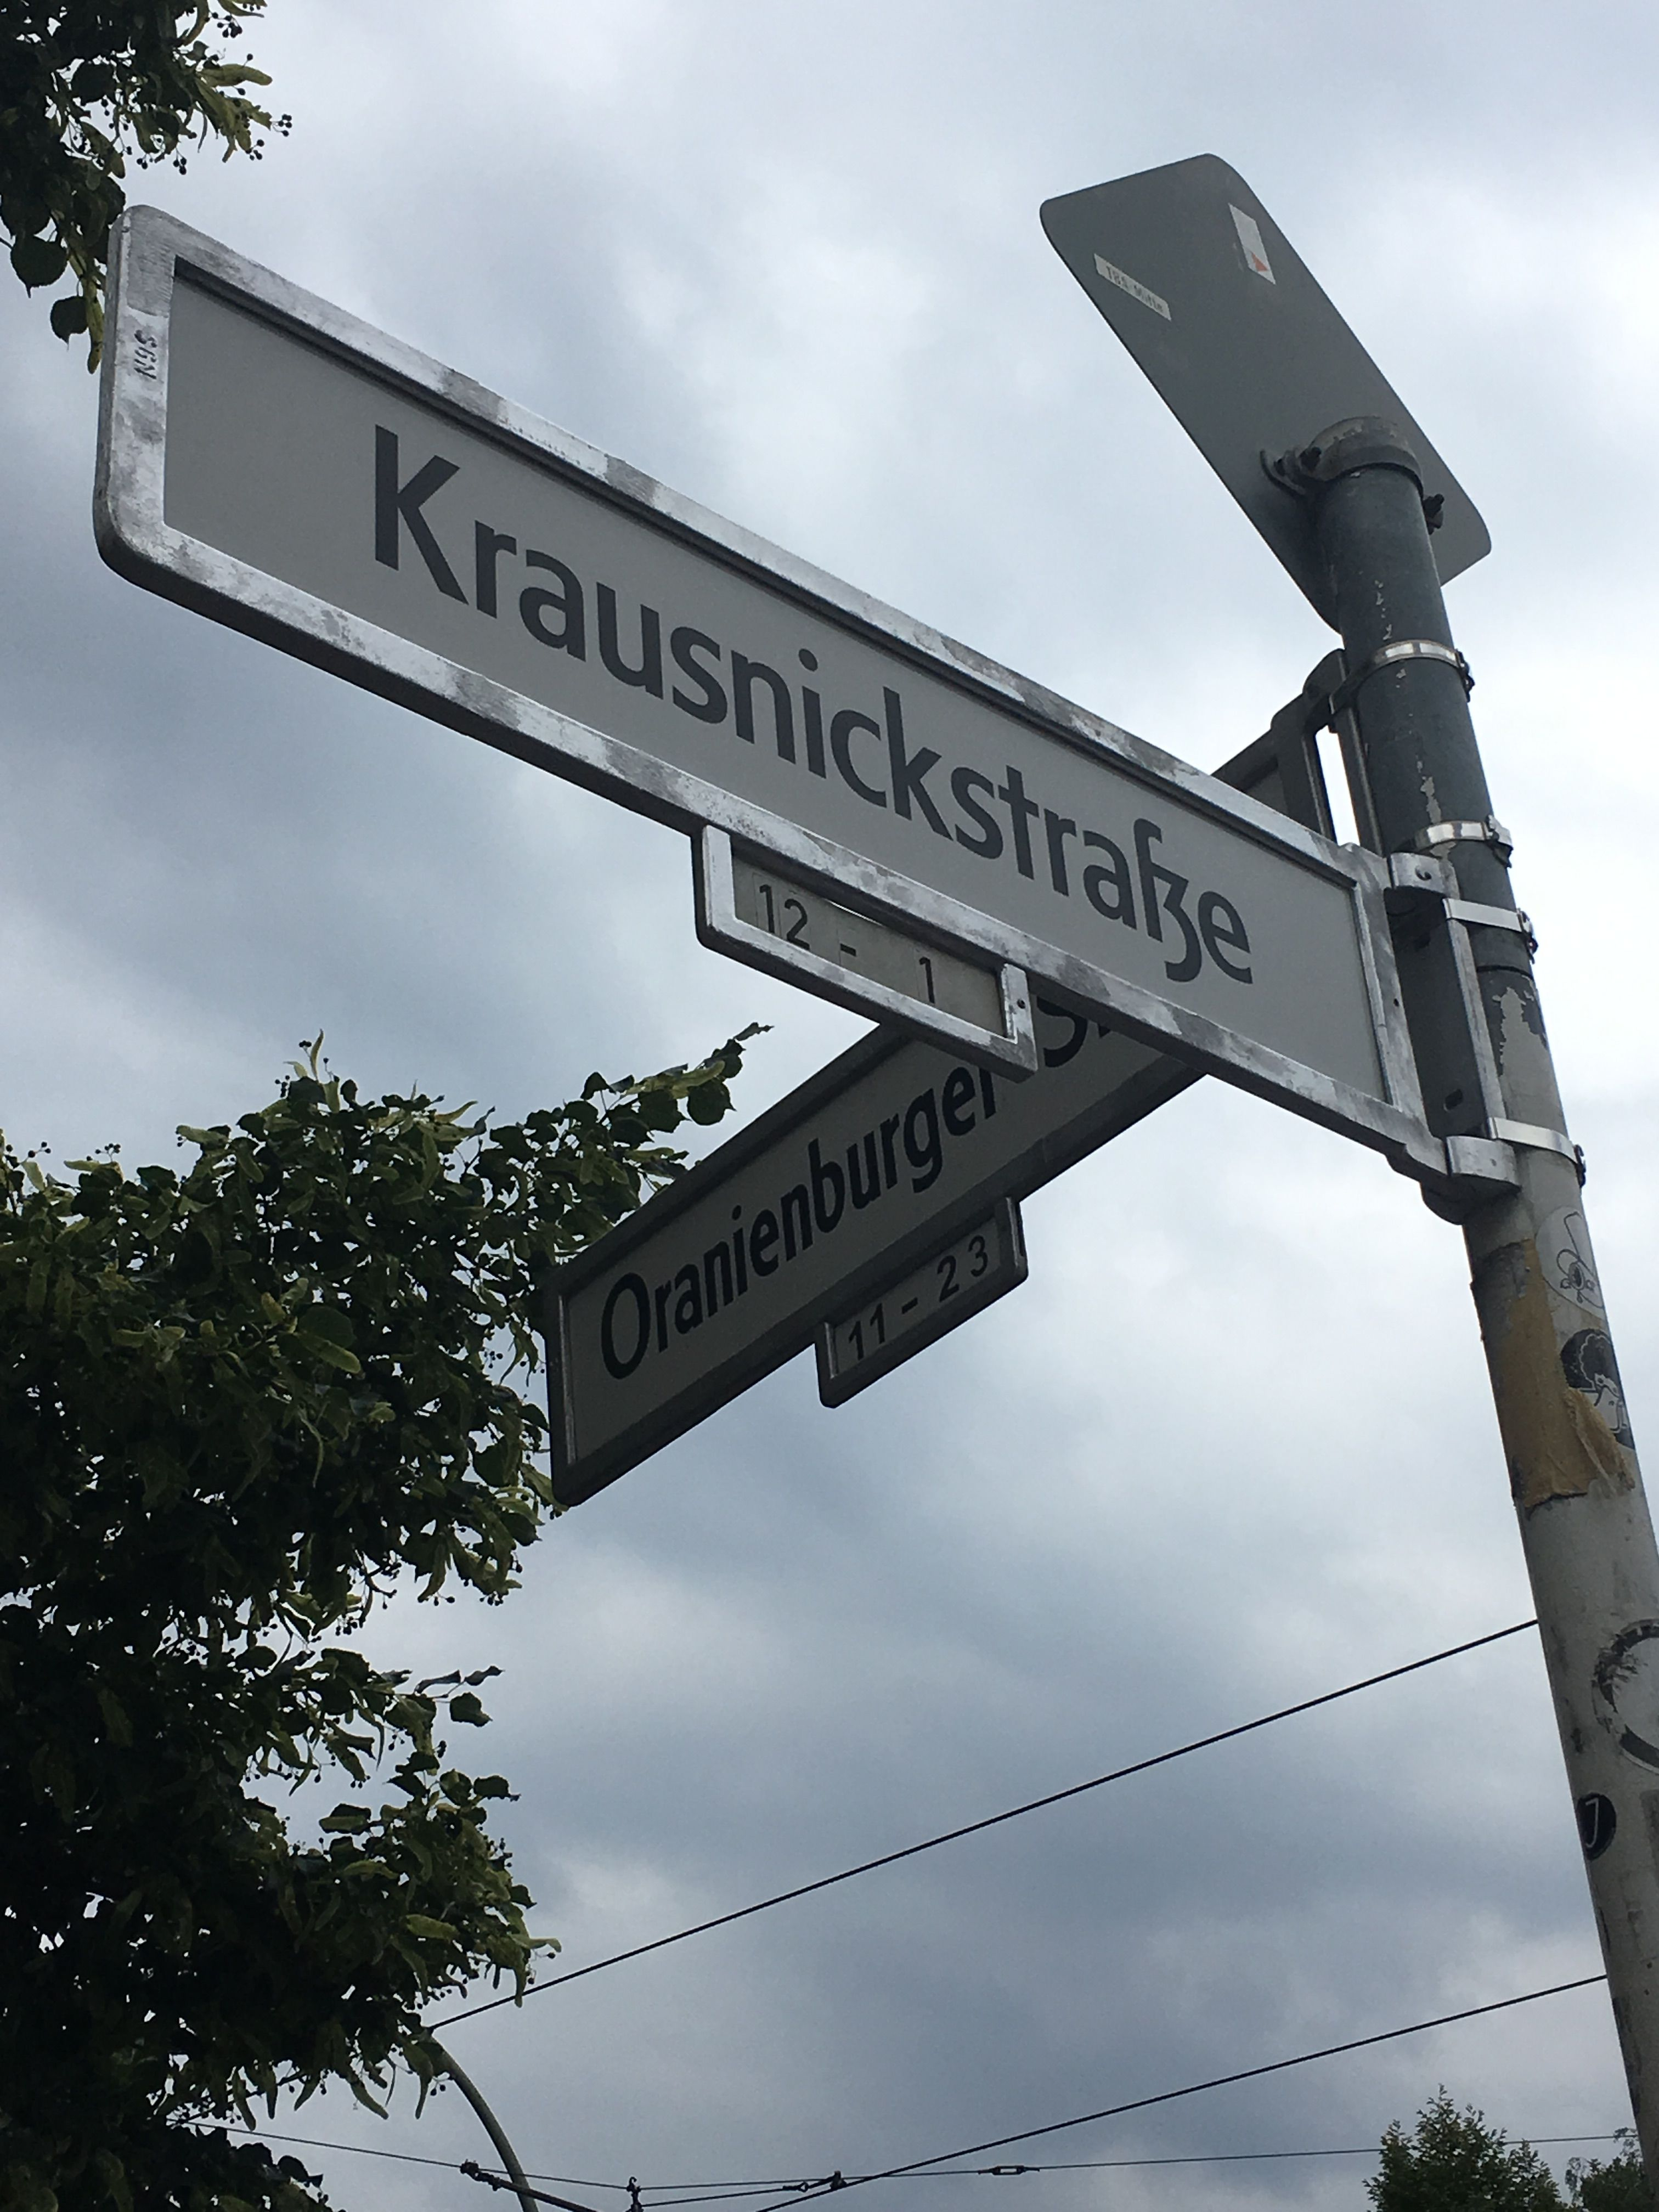 Cruce de calles en Berlín, Alemania